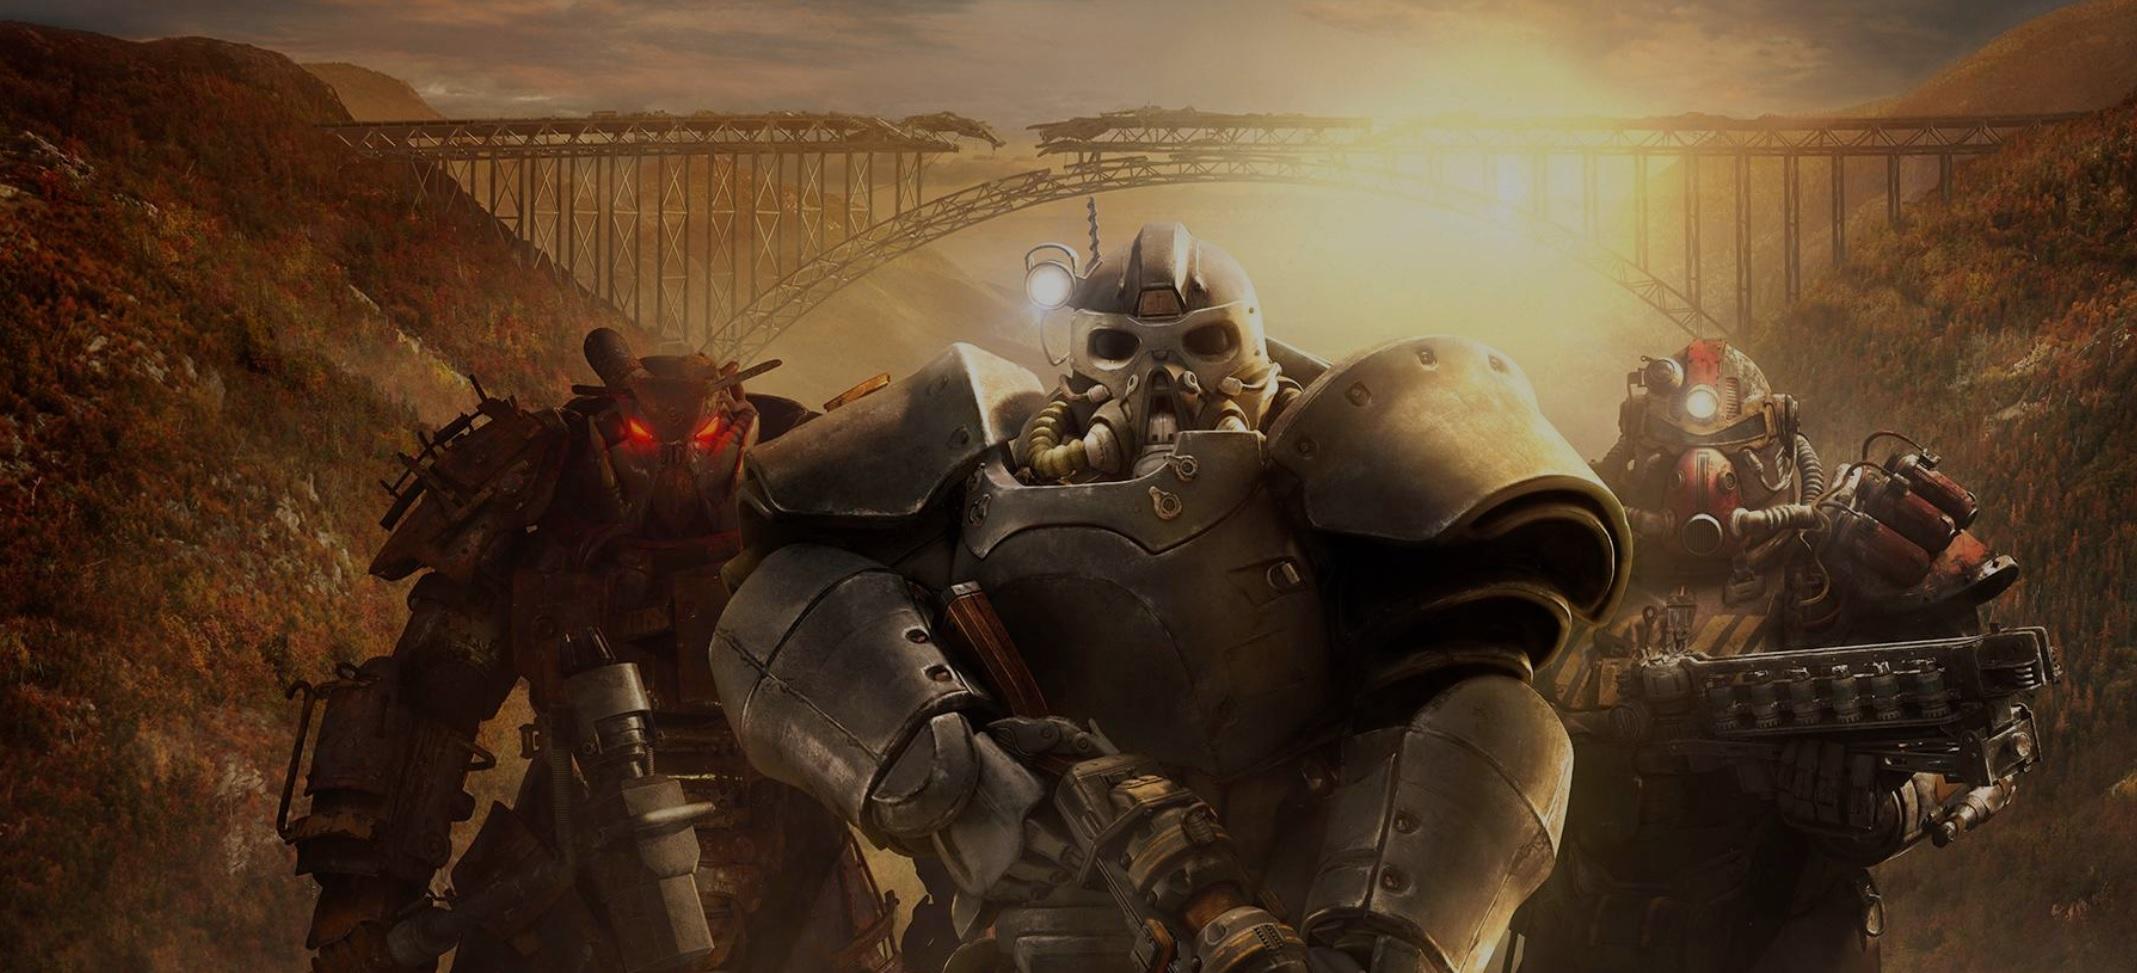 Bethesda finally reveals its 2020 roadmap plan for Fallout 76 beyond the recent Wastelanders DLC screenshot